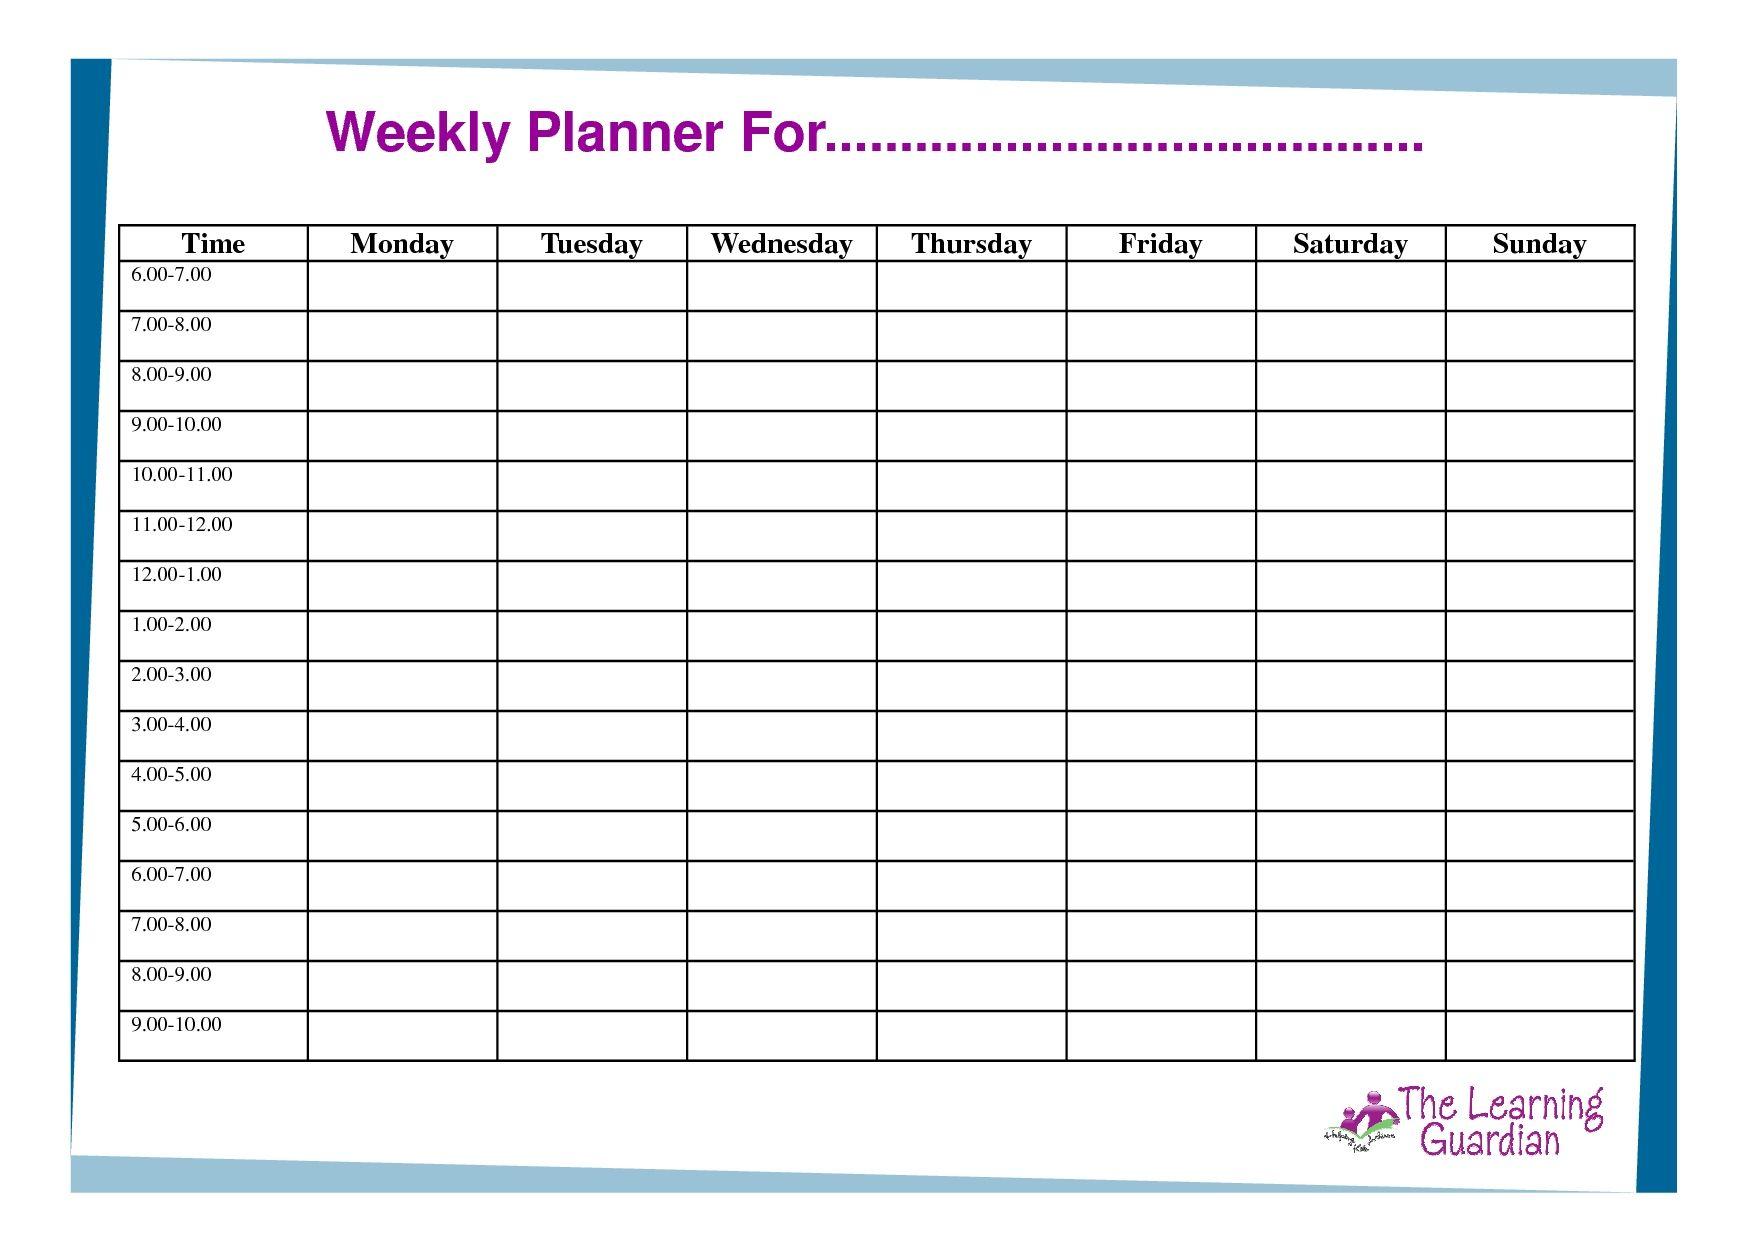 Free Printable Weekly Calendar Templates Weekly Planner For